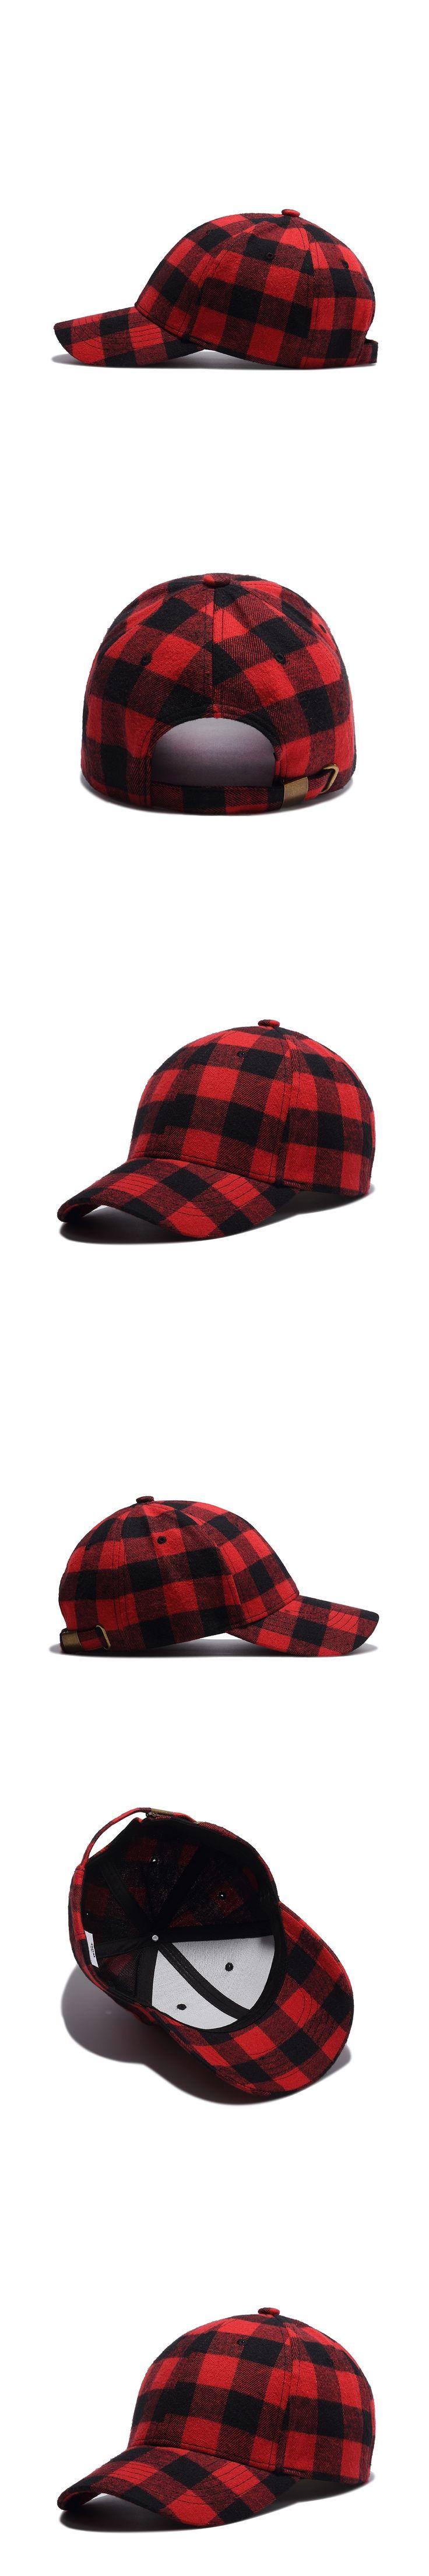 Hip hop dancers cap all-match fashion Plaid Cotton and summer baseball cap peaked cap Korean couple tide hat